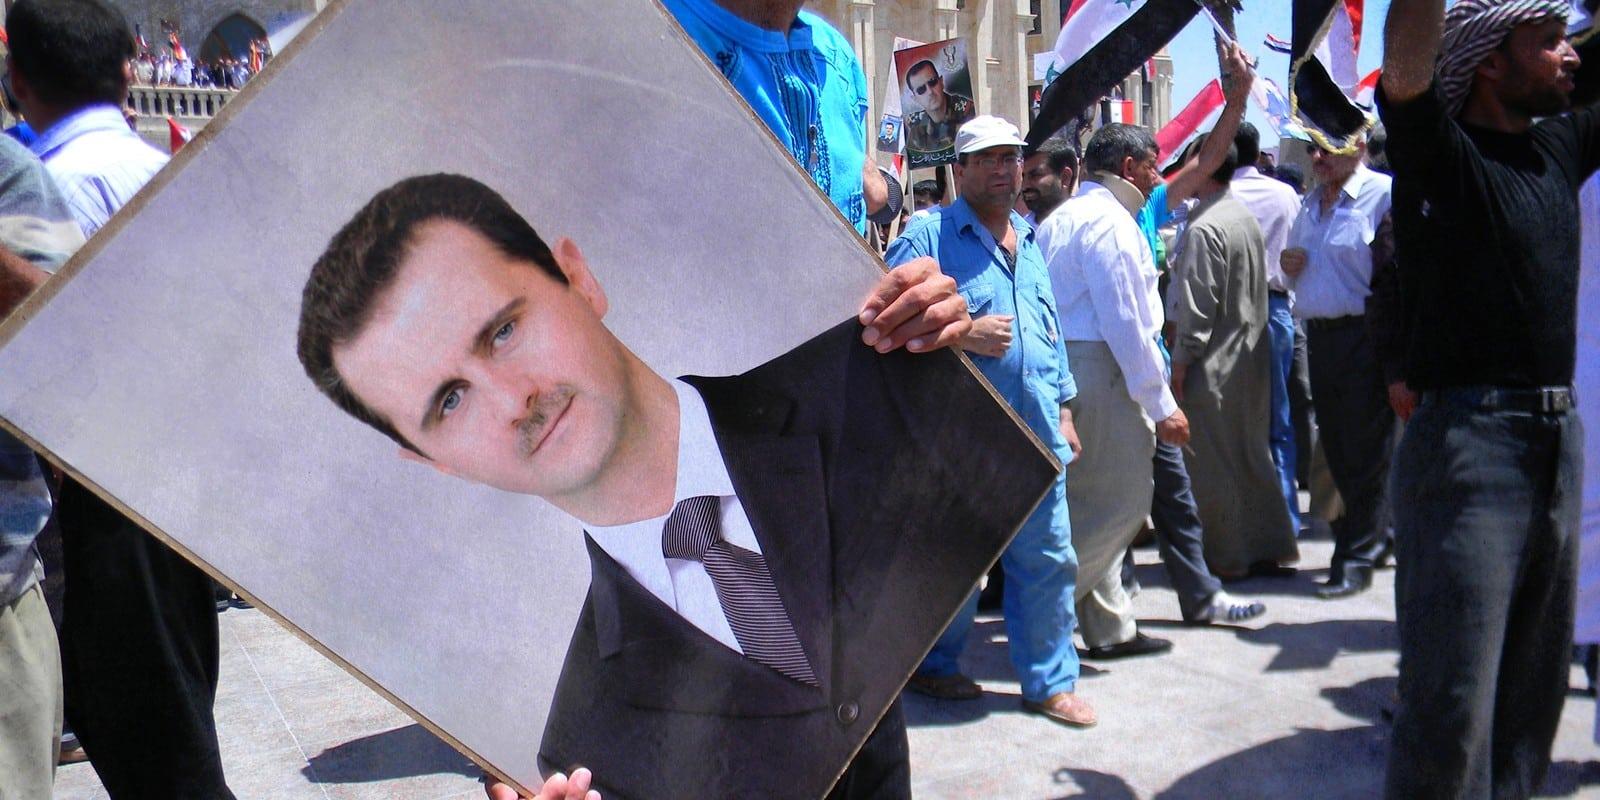 Protestor holding a photo of Assad